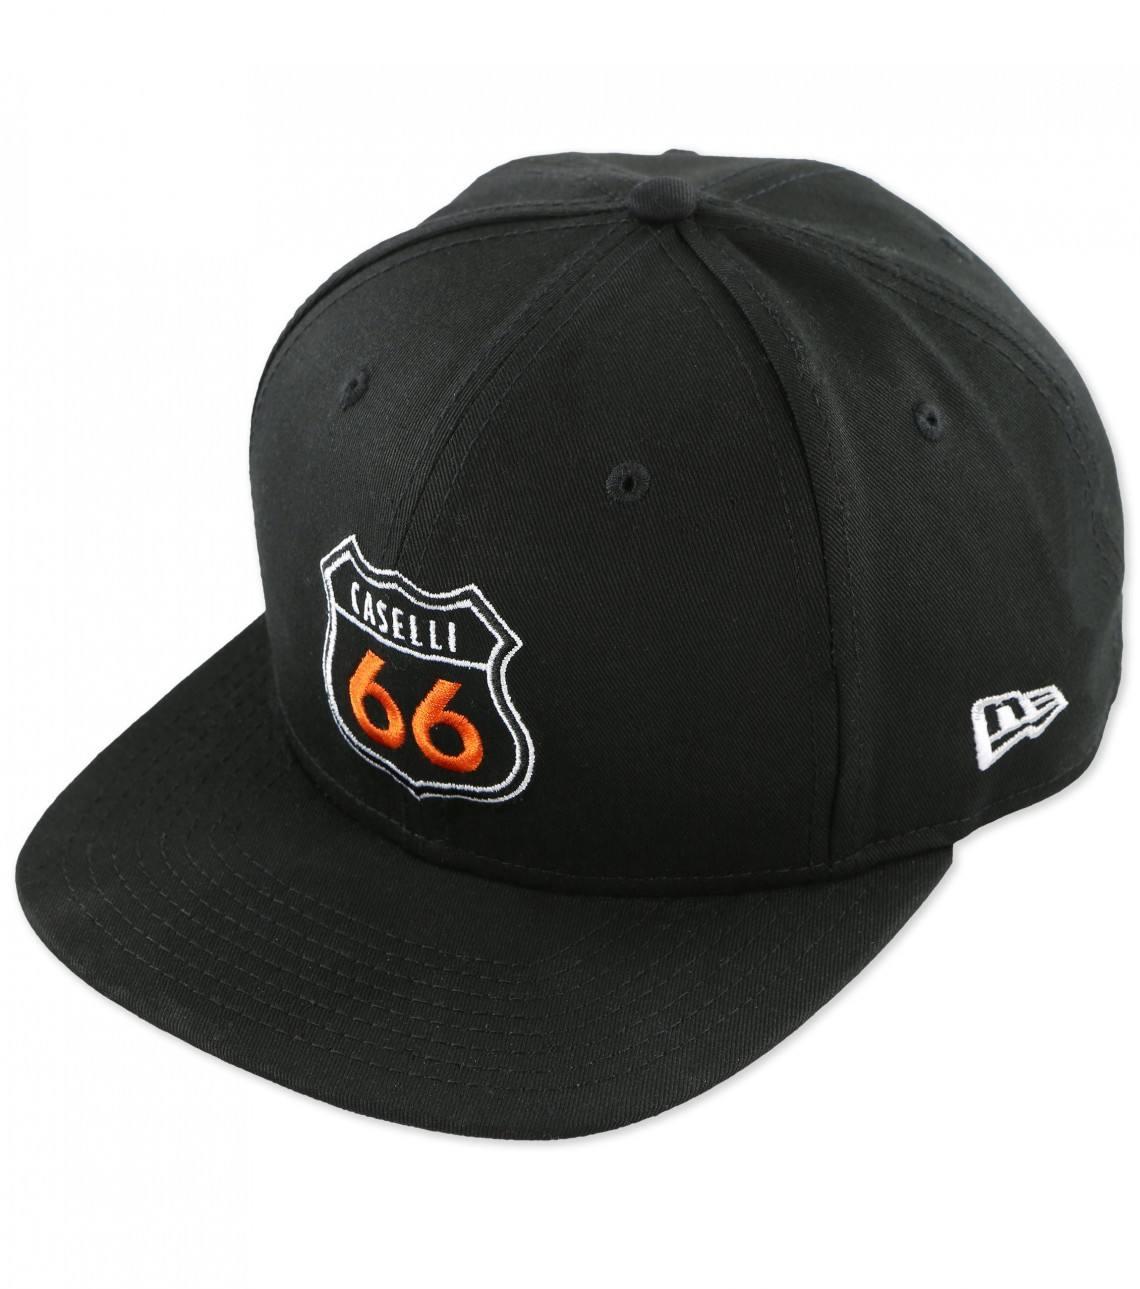 Caselli Forever Hat